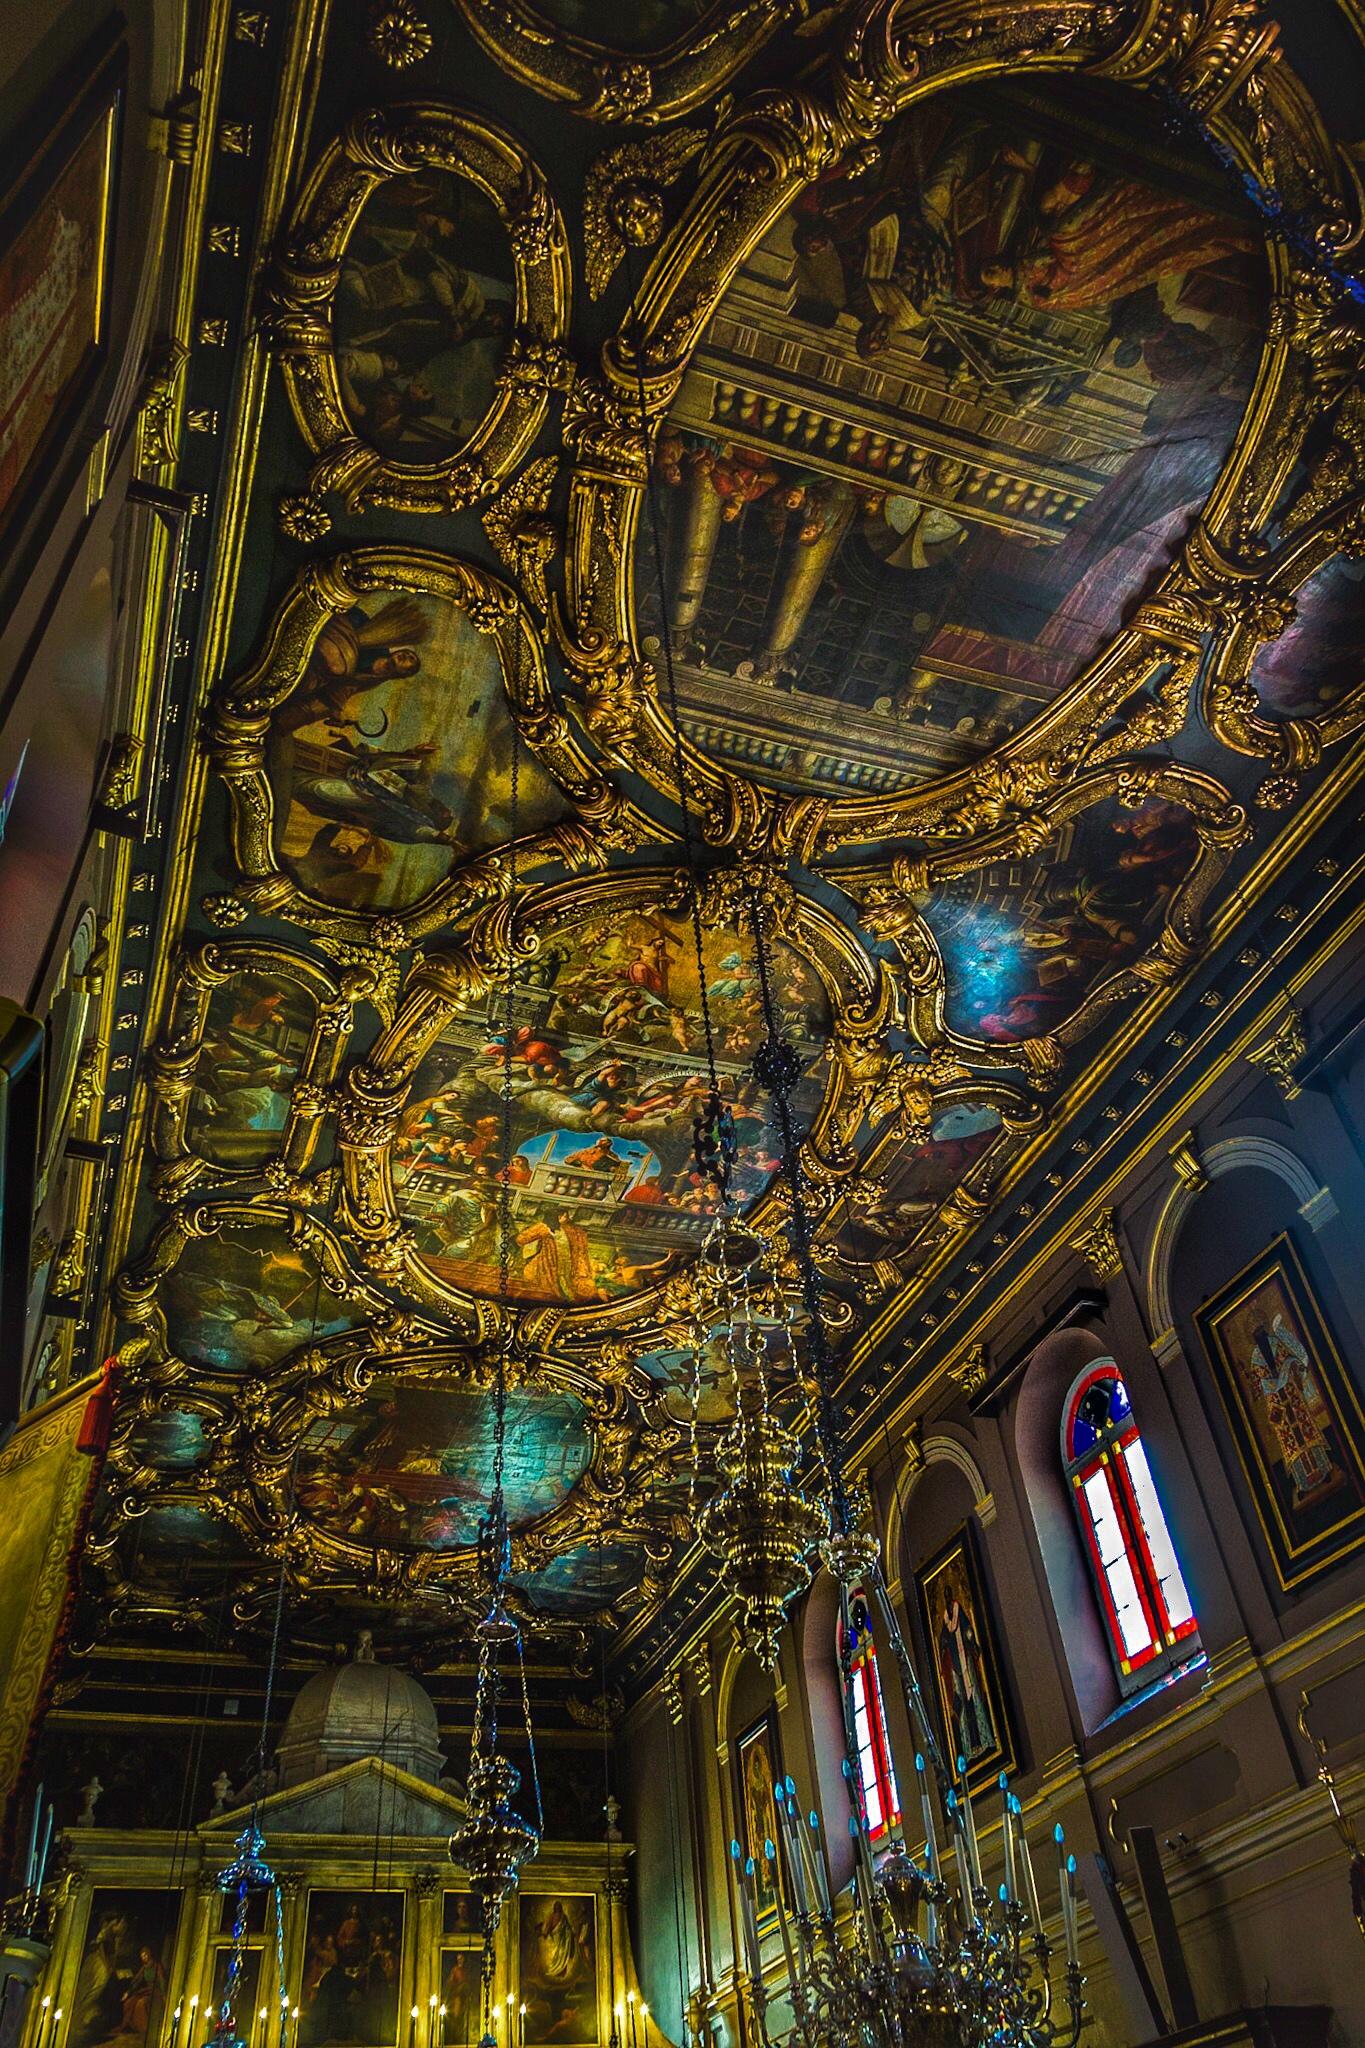 Church ceiling by Rick McEvoy interior photographer